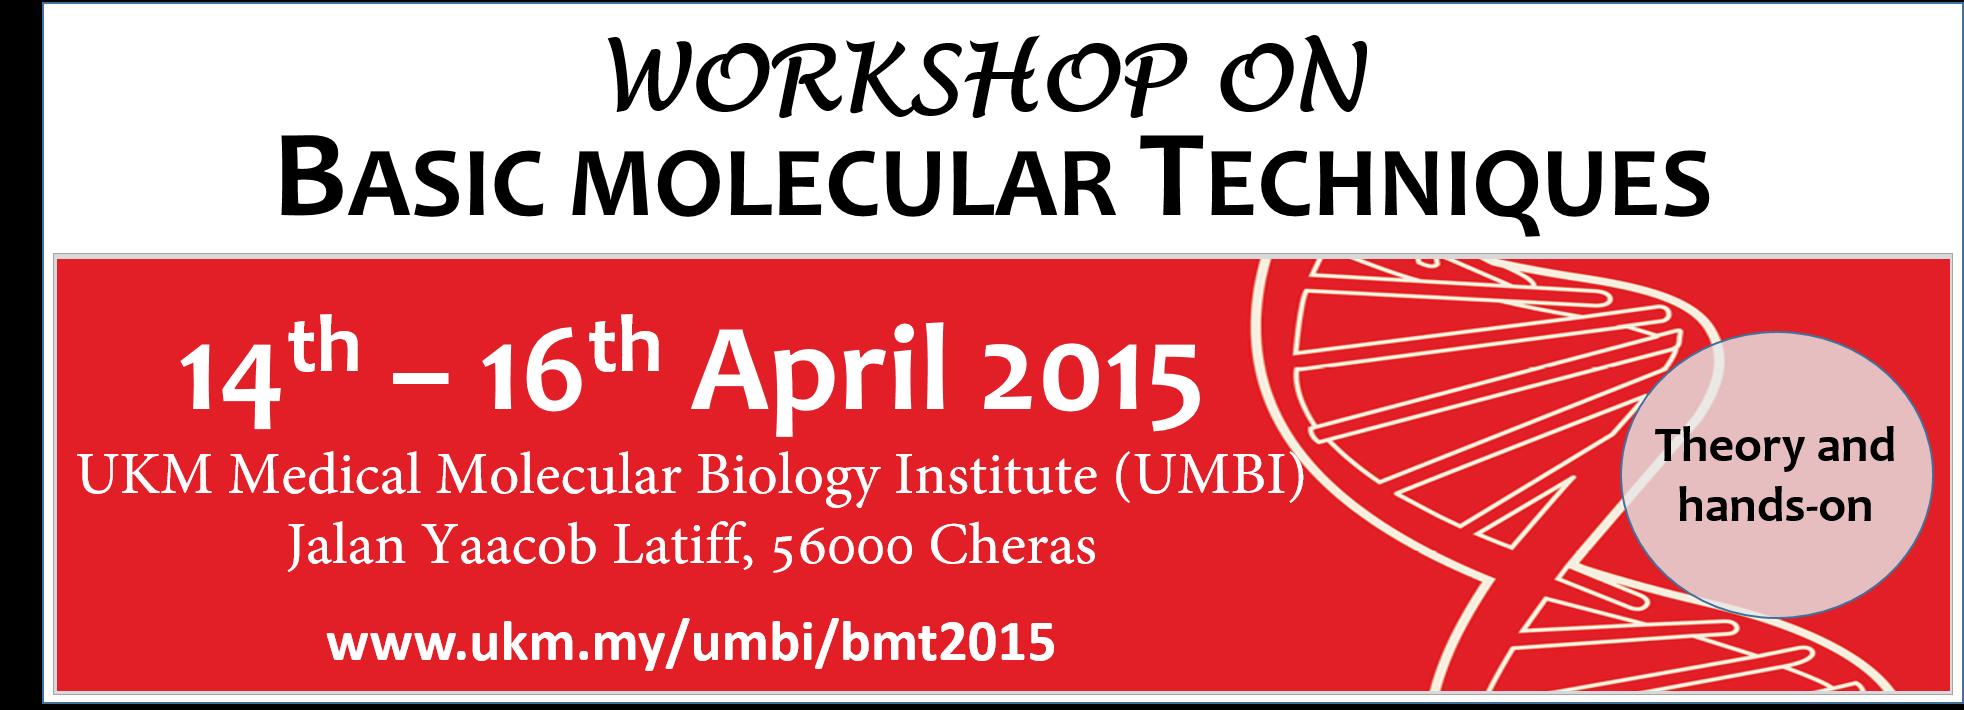 Workshop On Basic Molecular Techniques